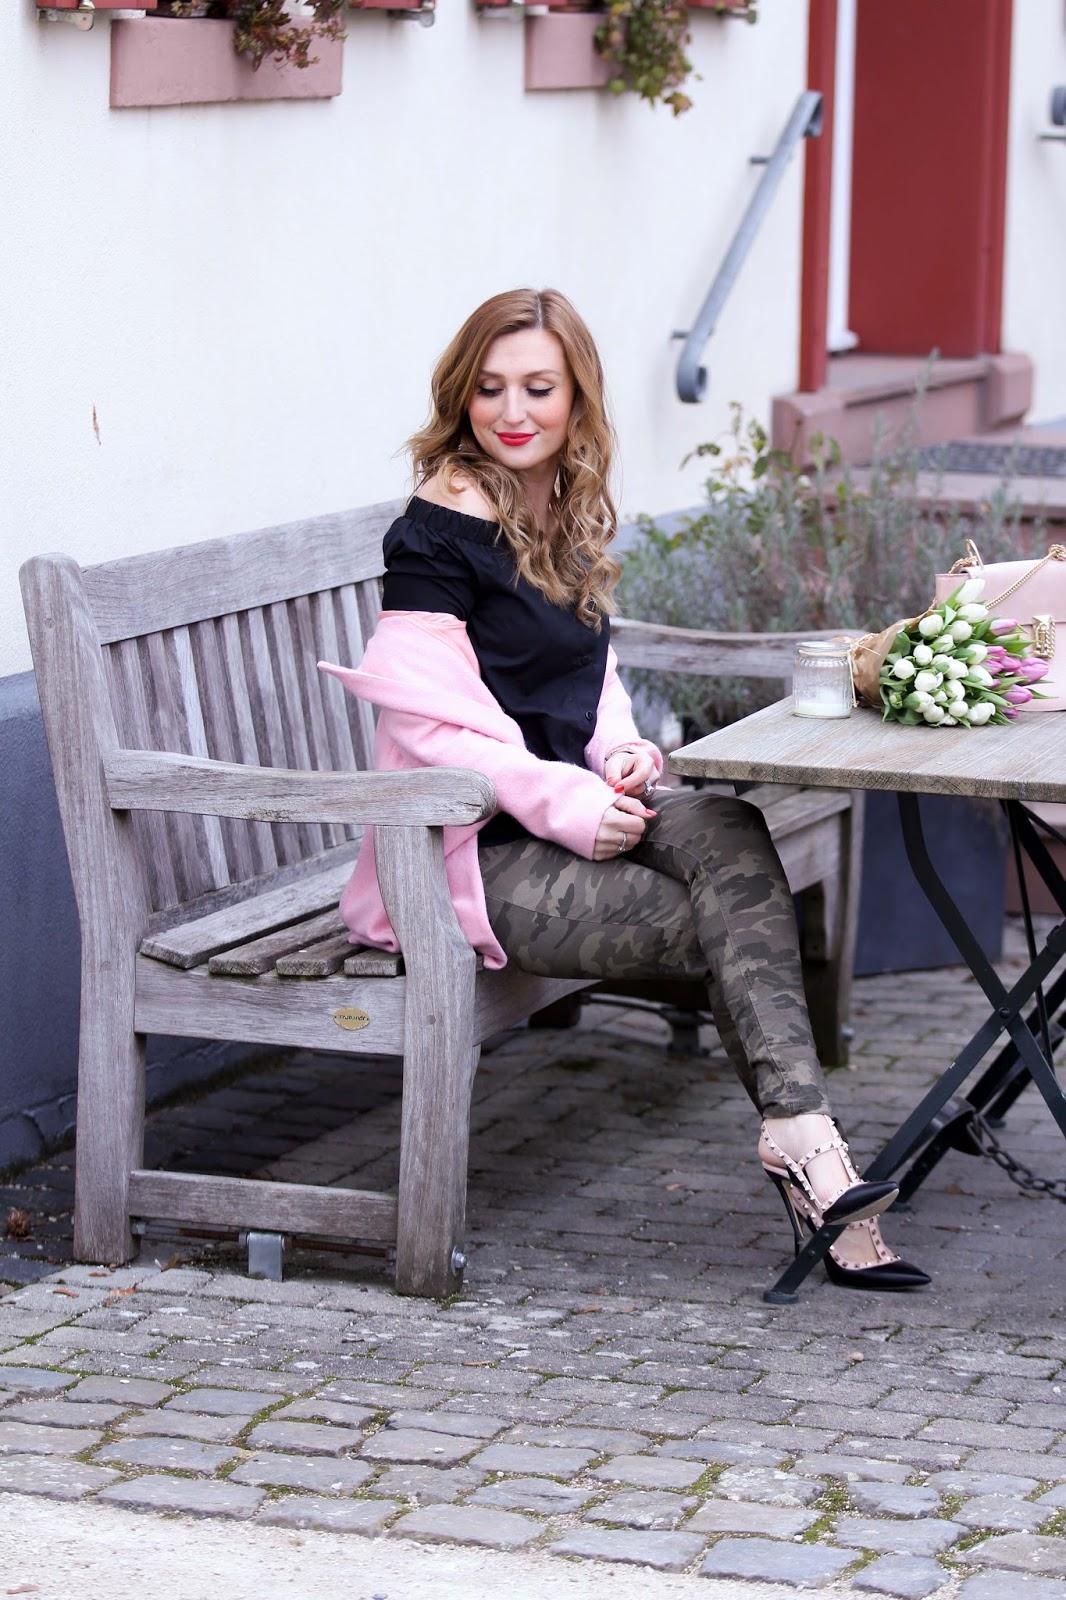 Off Soulder Bluse Und Rosa Mantel Fashionstylebyjohanna